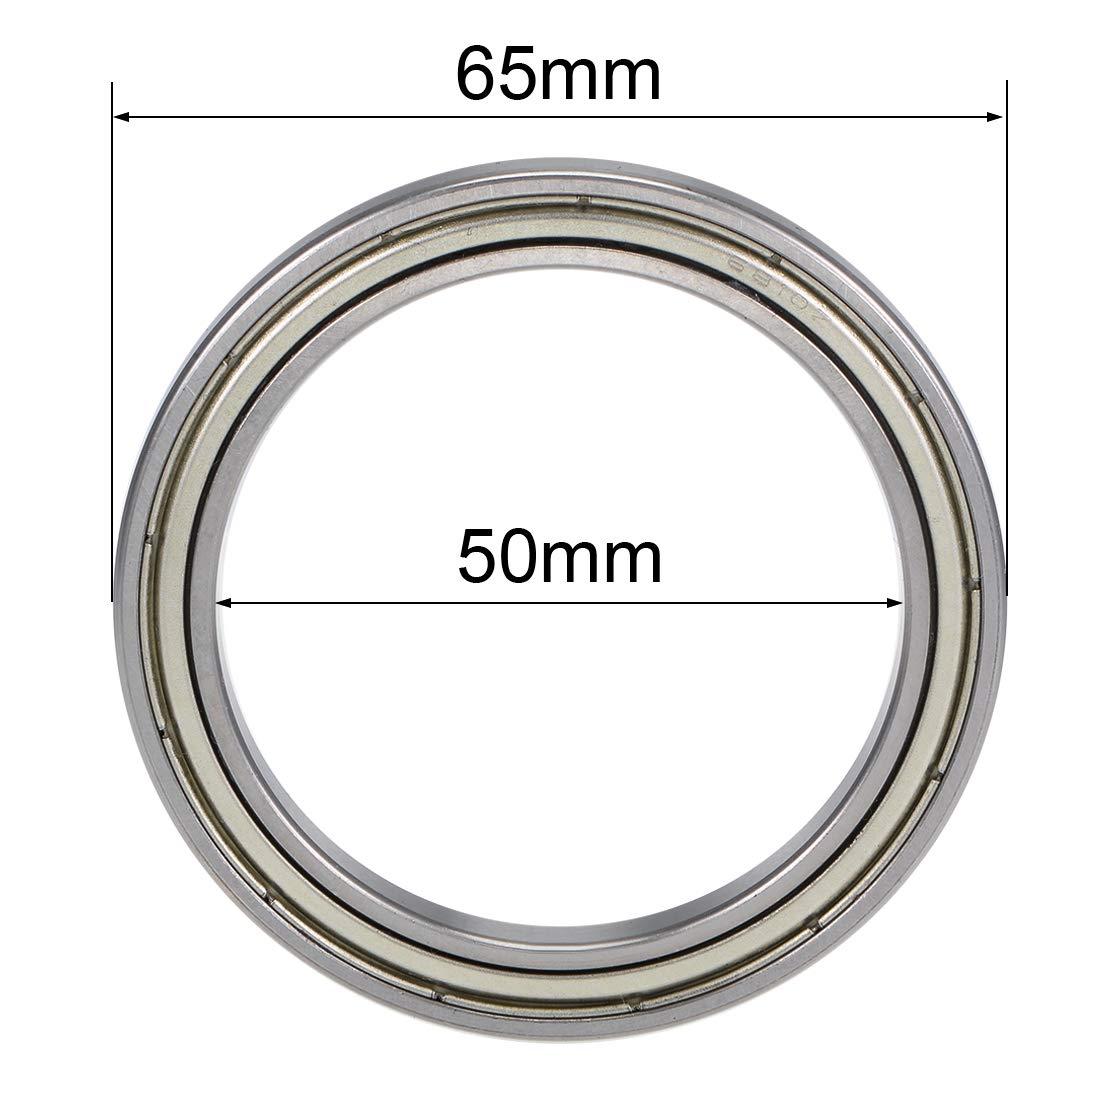 uxcell 6810ZZ Deep Groove Ball Bearings 50mm Inner Dia 65mm OD 7mm Bore Double Shielded Chrome Steel Z2 2pcs